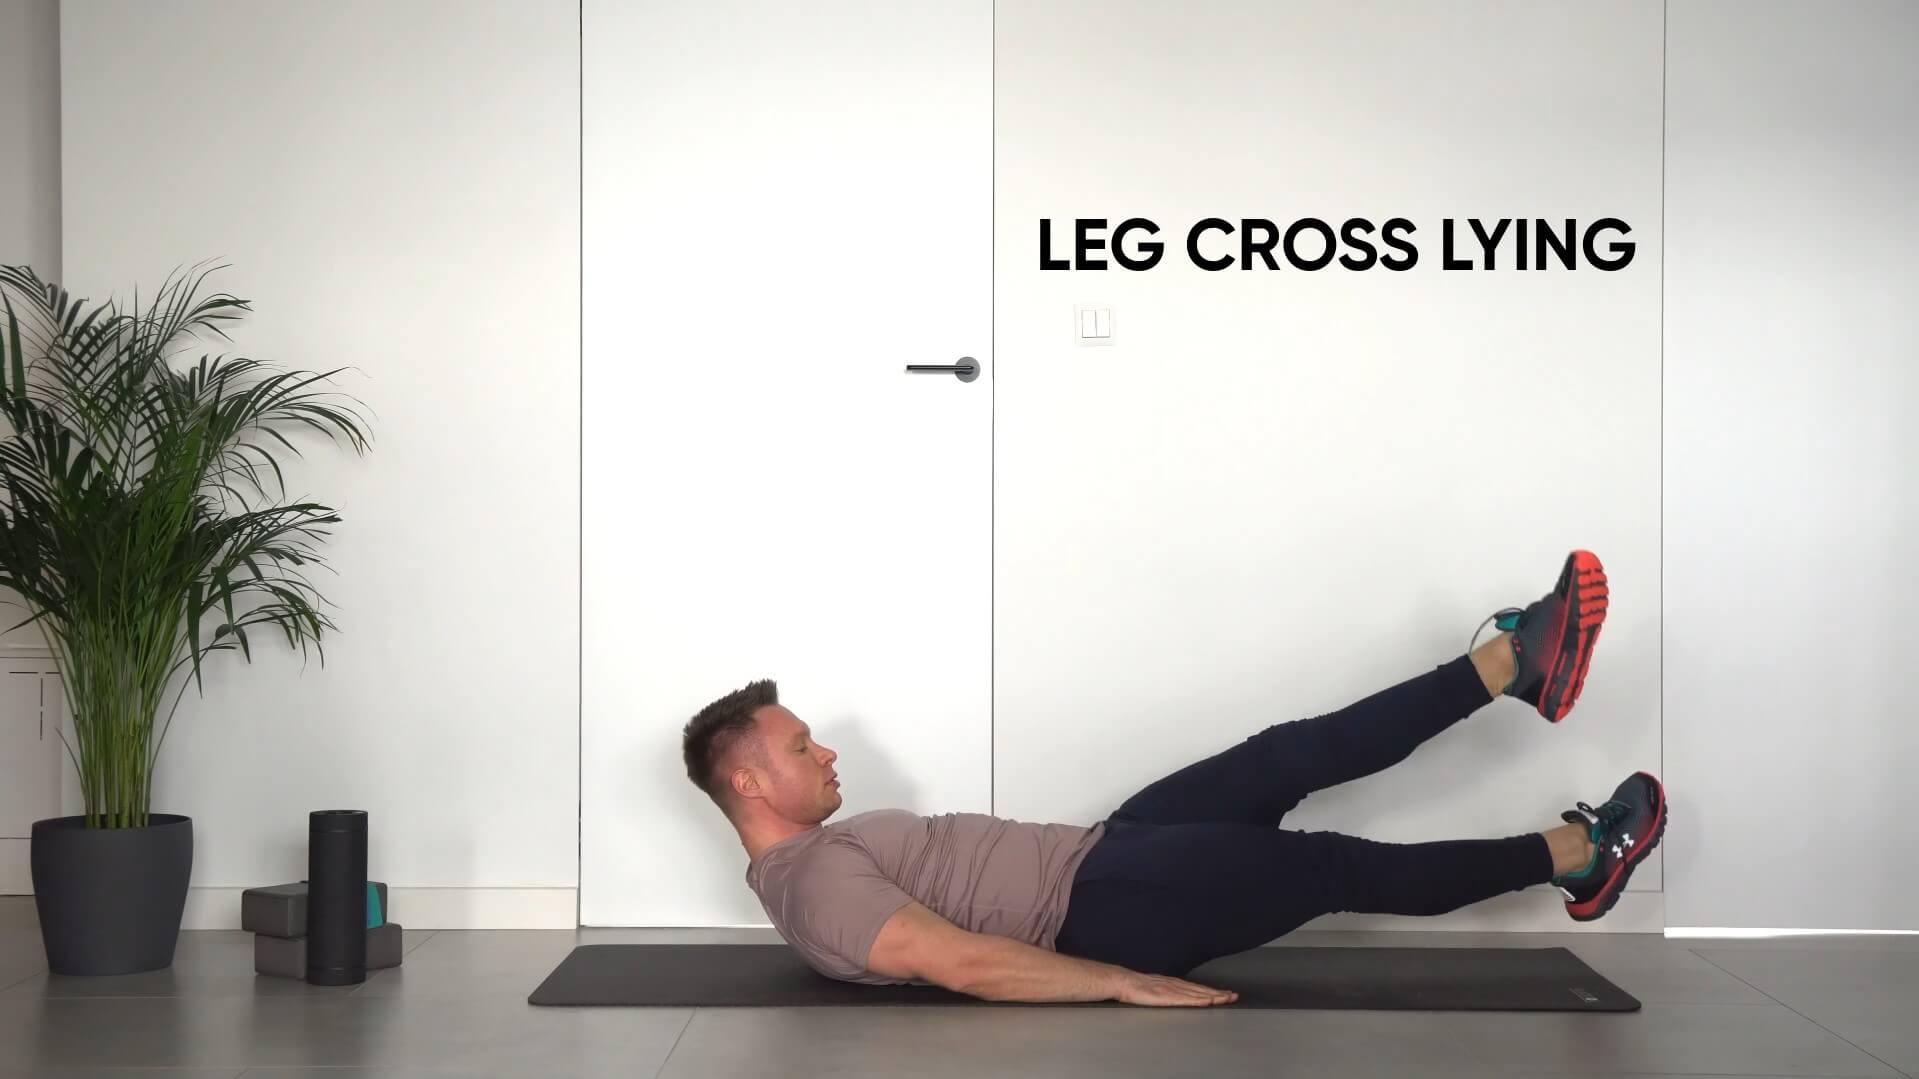 Leg cross lying